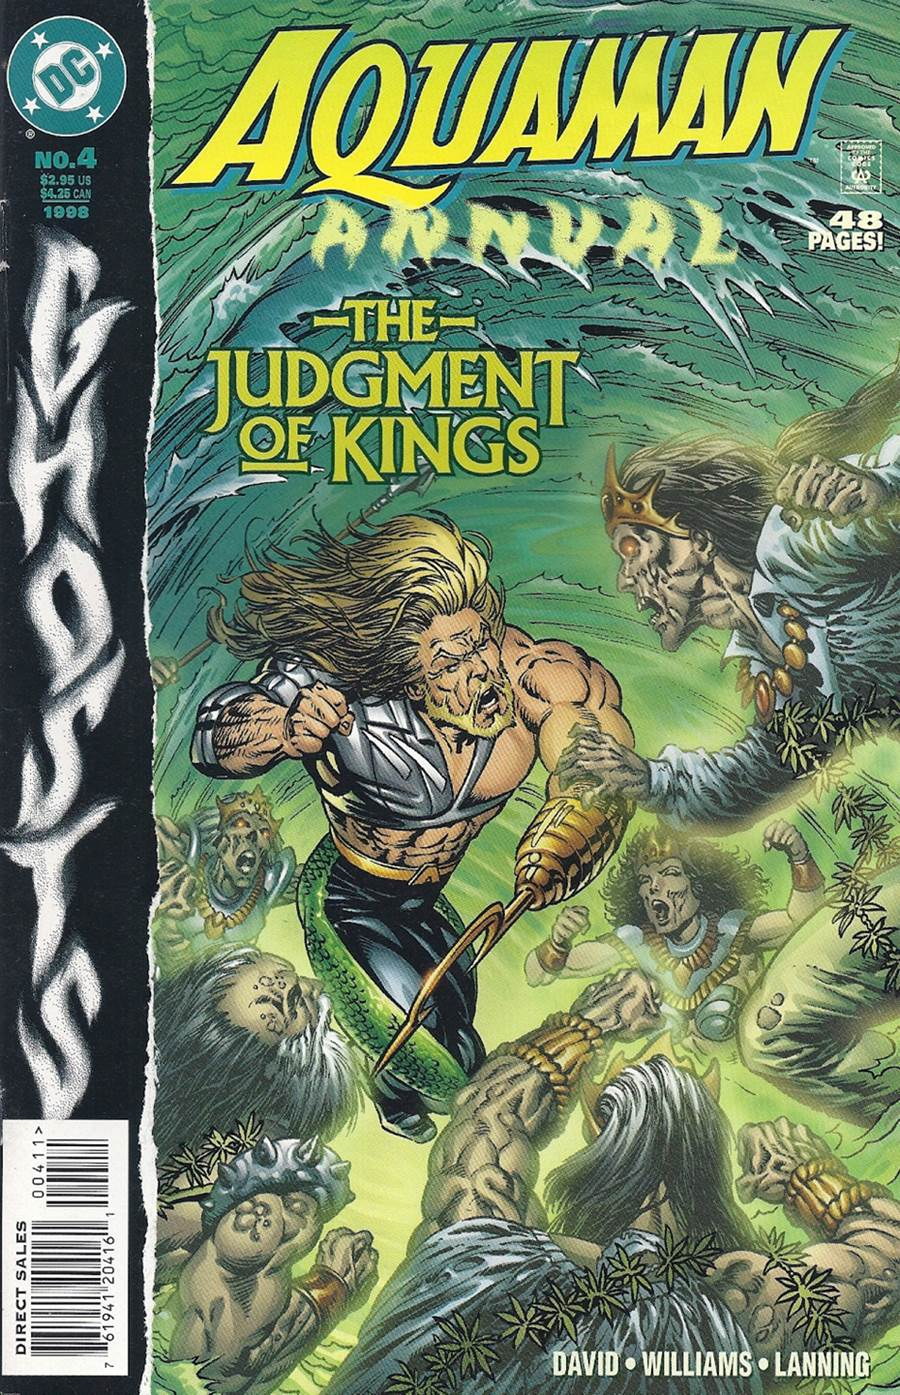 Aquaman Annual (1994) #4, cover by Berni Wrightson.